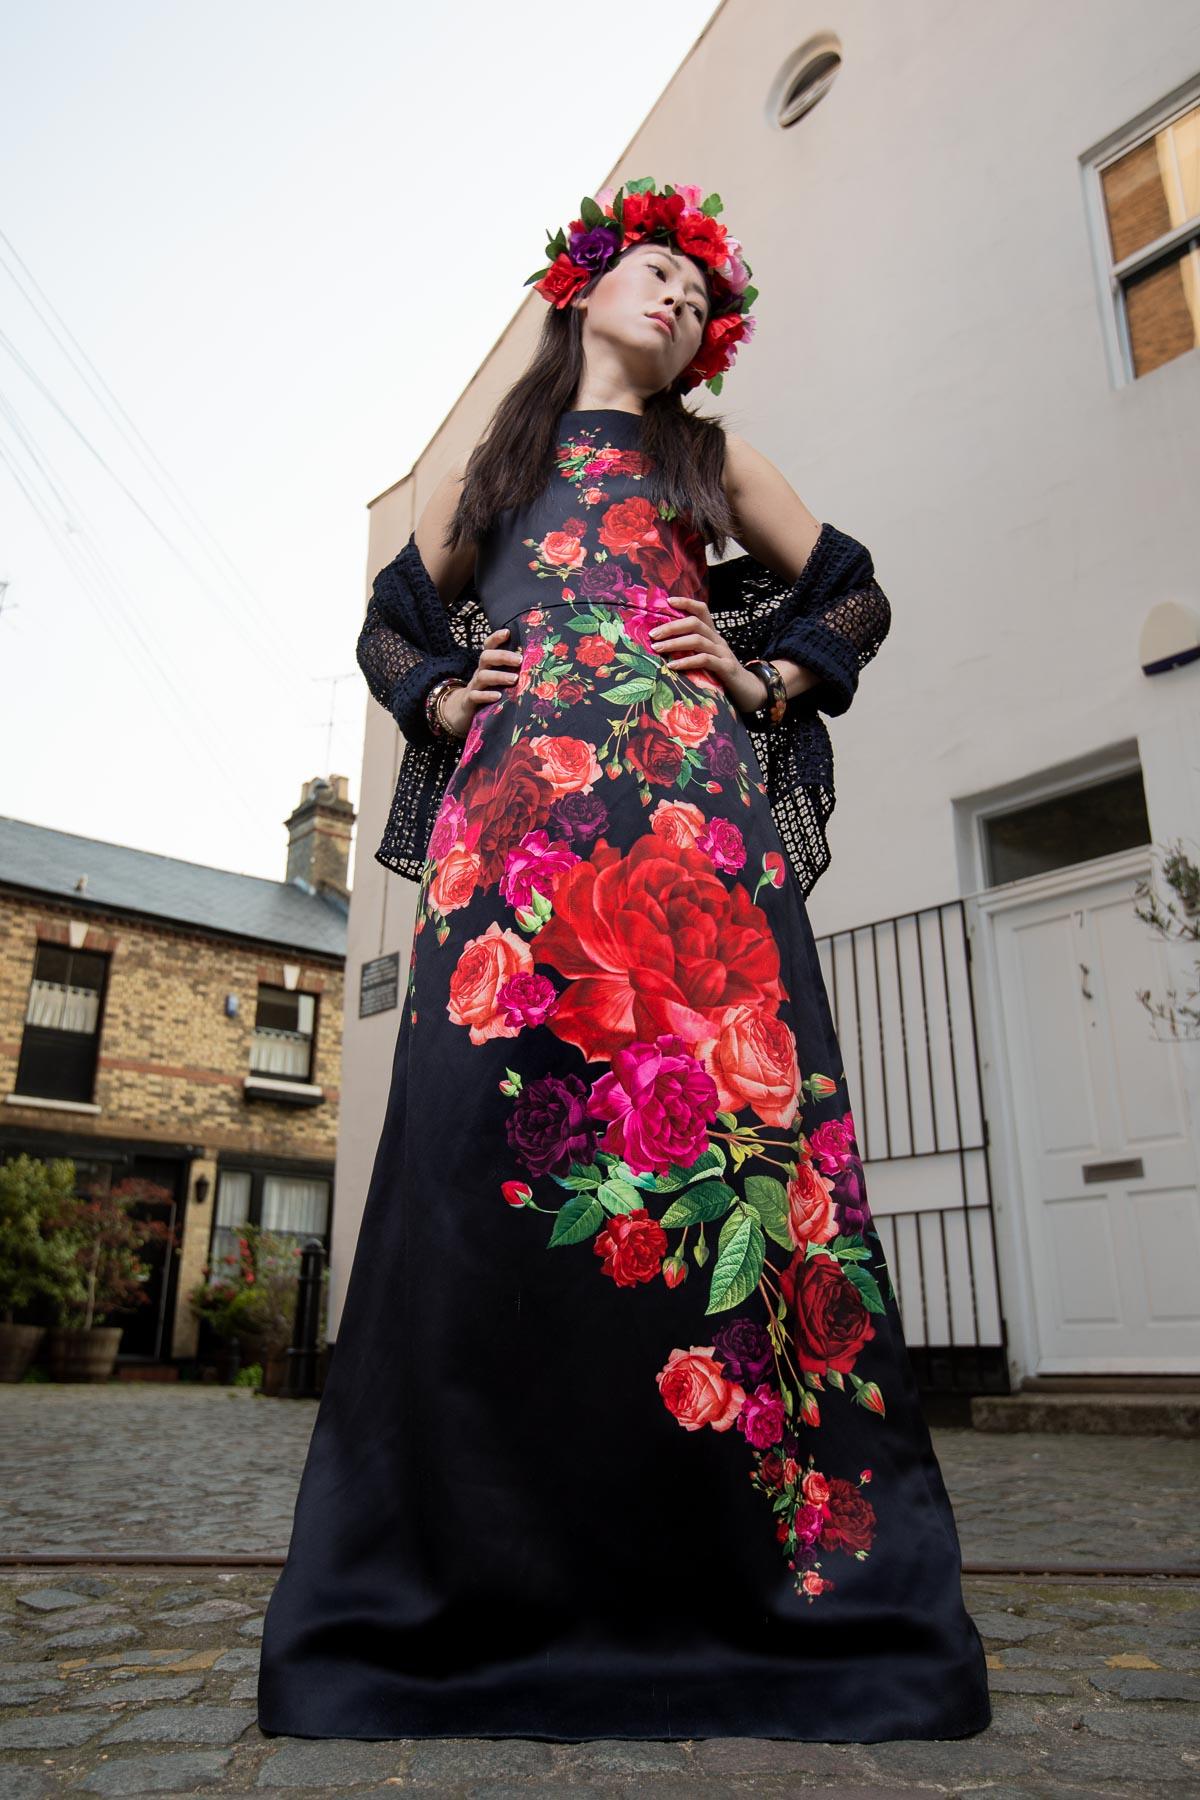 Russian-style-fashion-photographer-london-floral-Русский-стиль-мода-павловопосадский-платок-natalia-smith-photography-0017.jpg